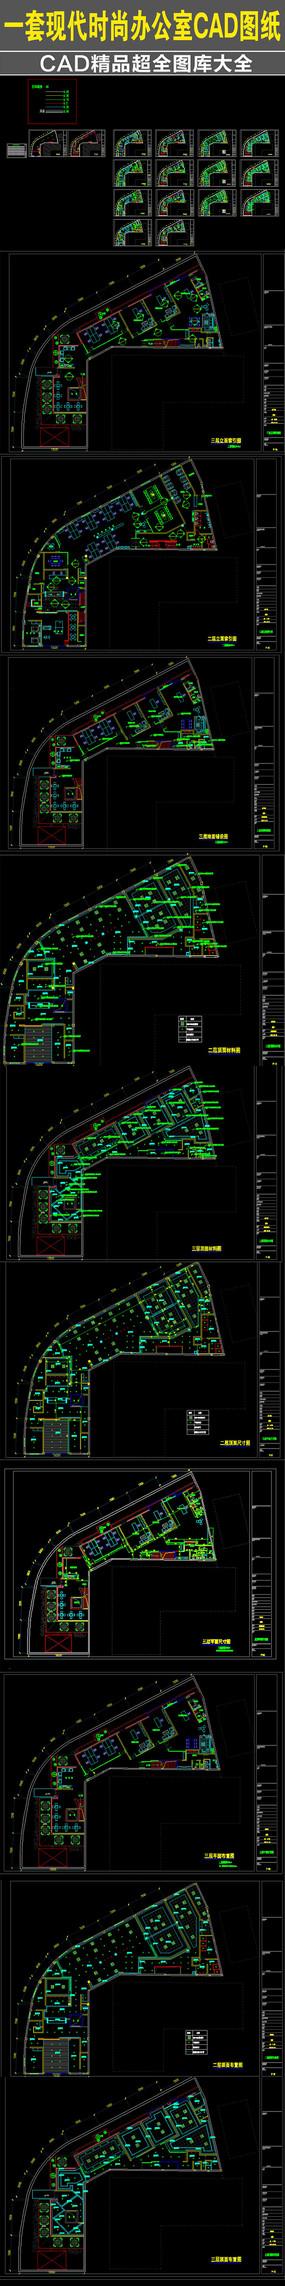 一套完整办公室CAD